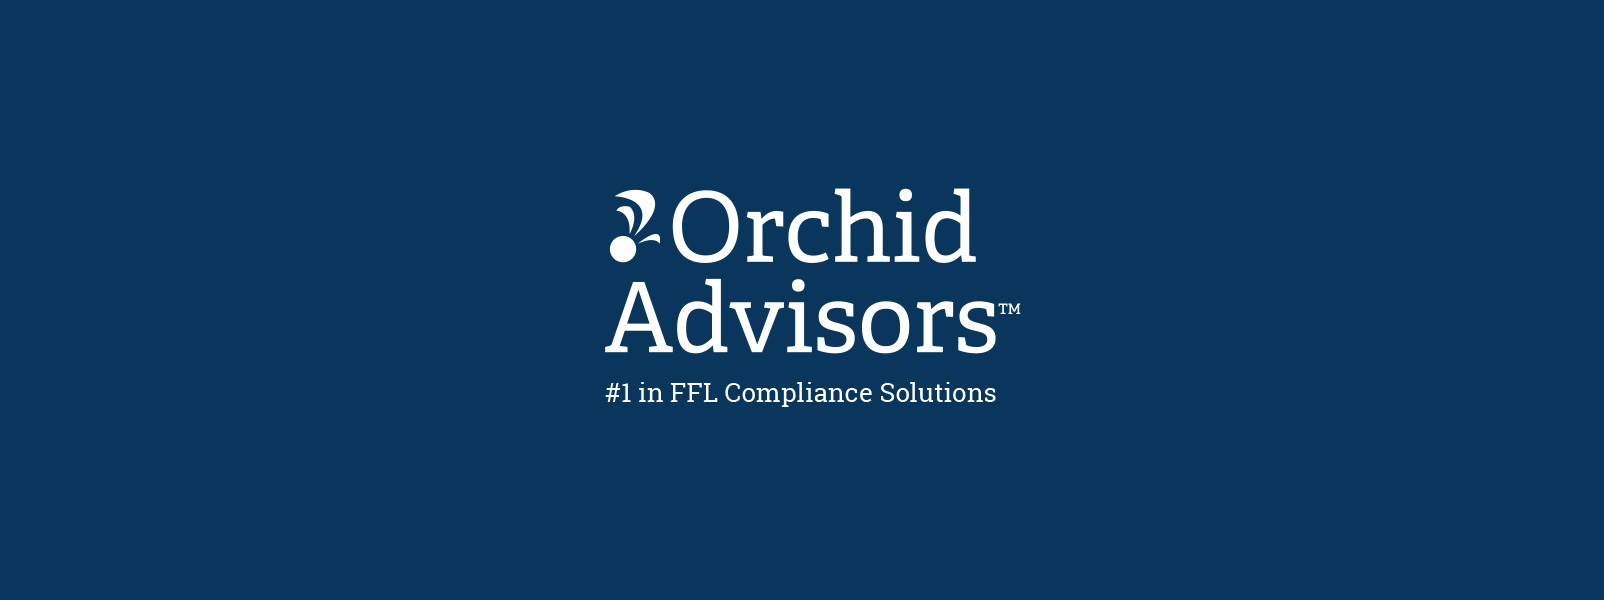 ORCHID ADVISORS BECOMES HOST SPONSOR OF ASA INDUSTRY FORUM